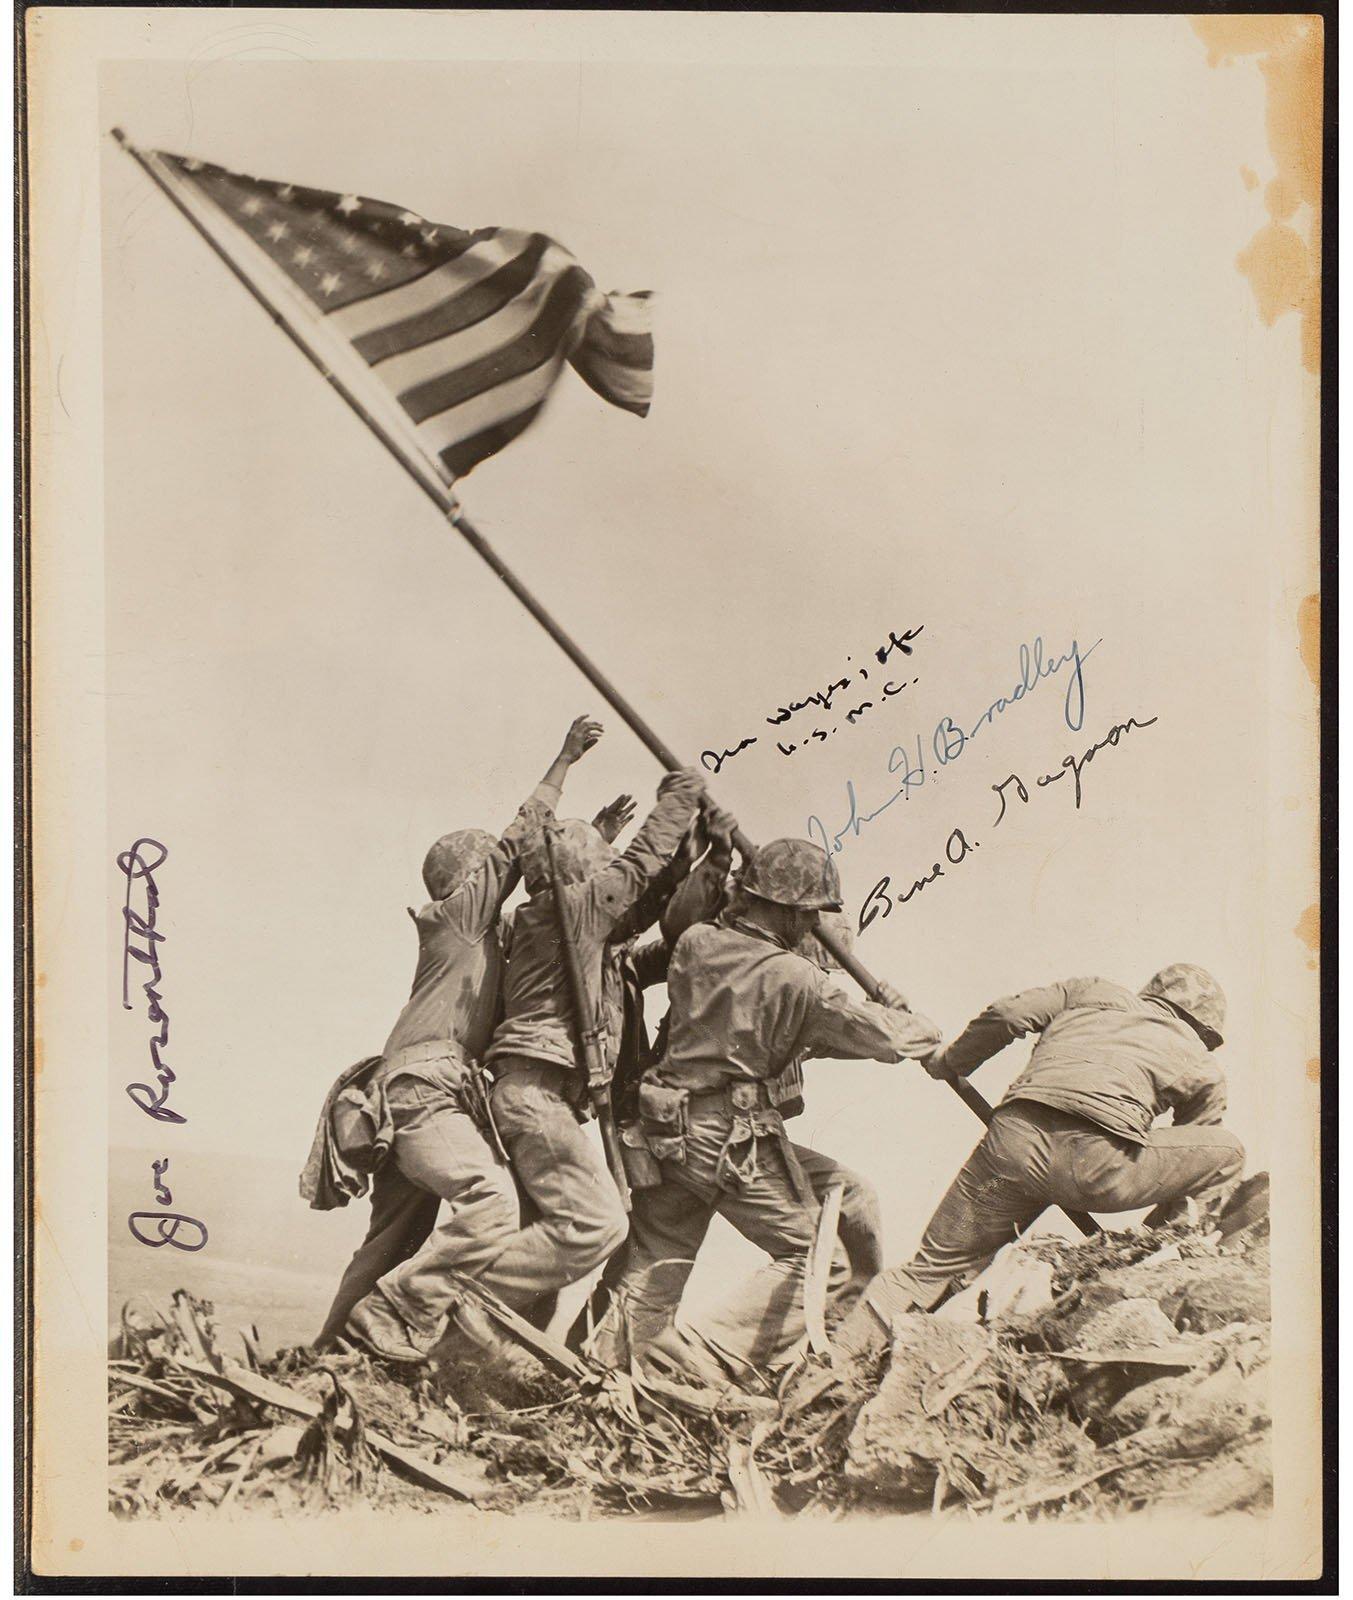 Raising the Flag on Iwo Jima  by Joe Rosenthal. Photo courtesy of Heritage Auctions